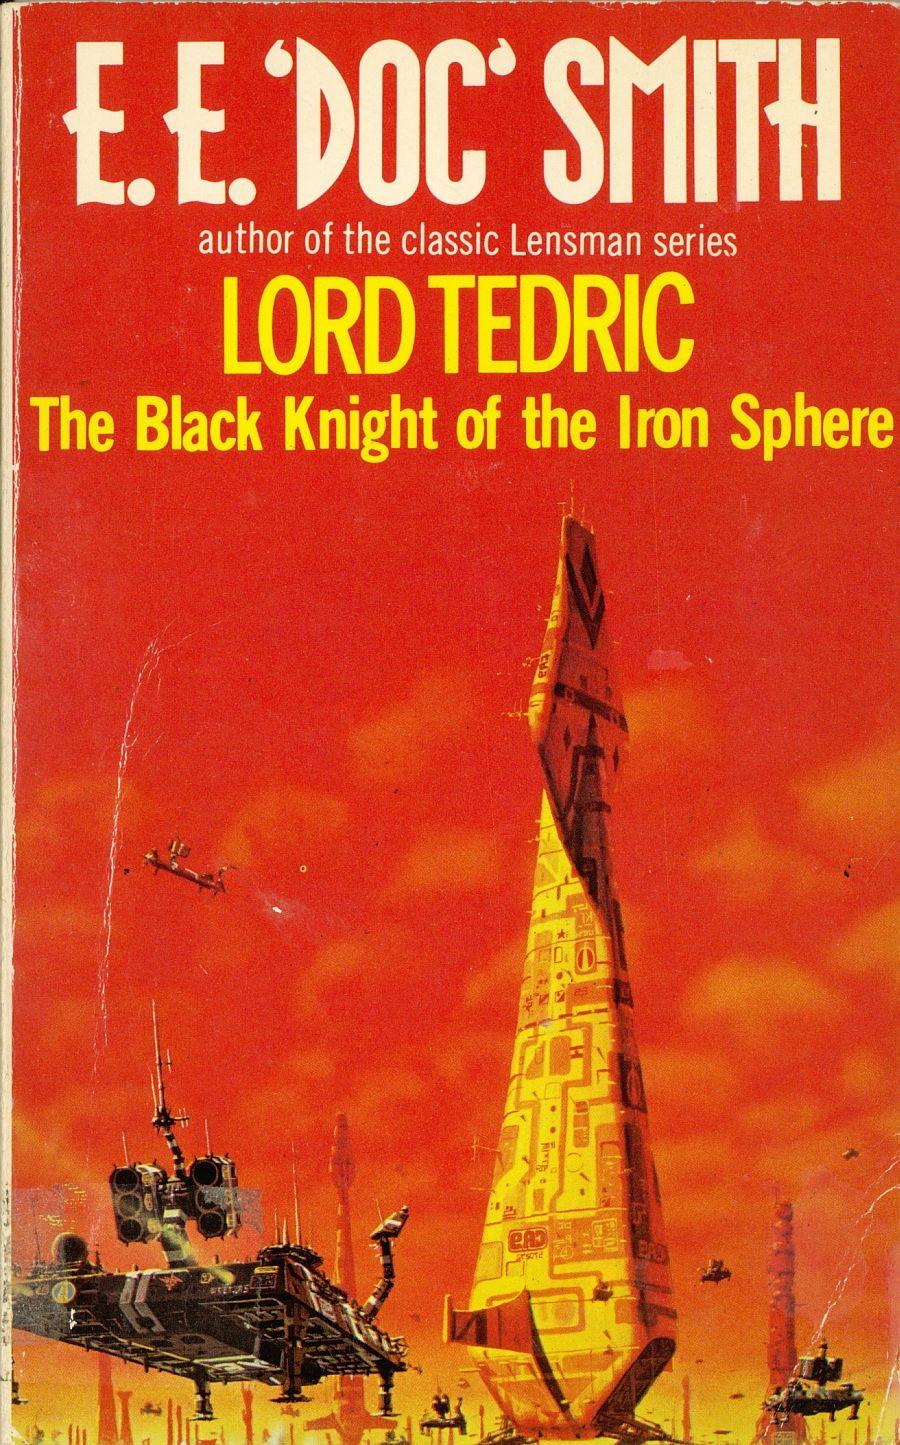 E.E. Doc Smith - Lord Tedric